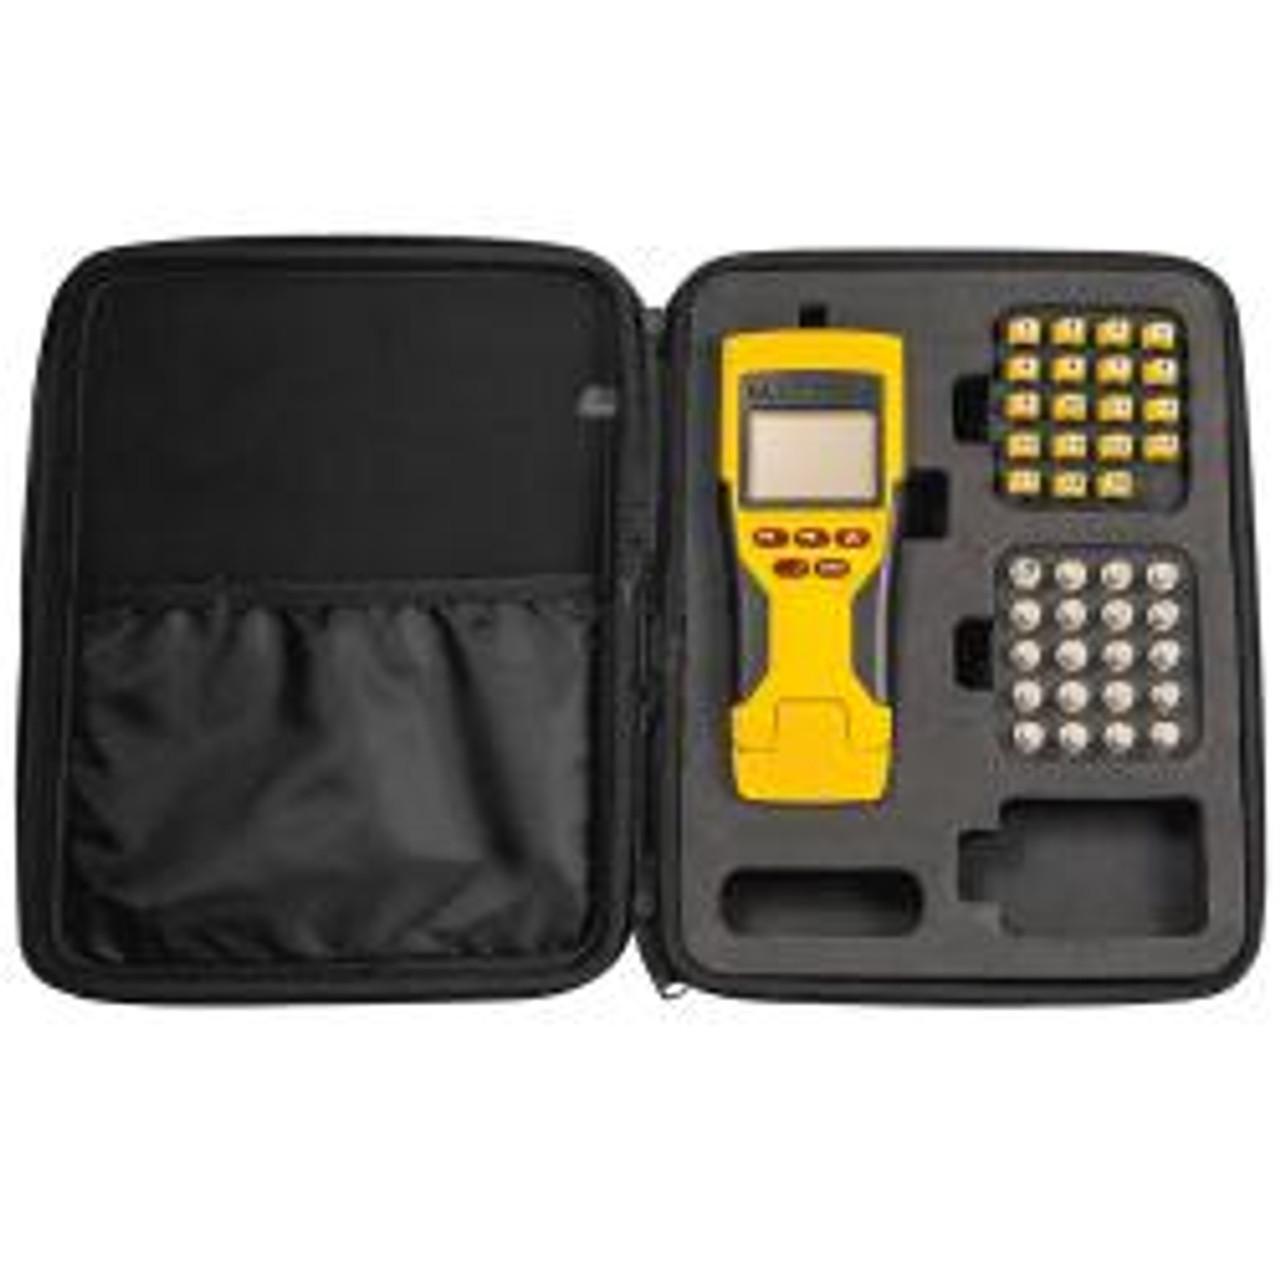 Klein VDV501-825 Scout Pro 2 LT Tester and Remote Kit 1